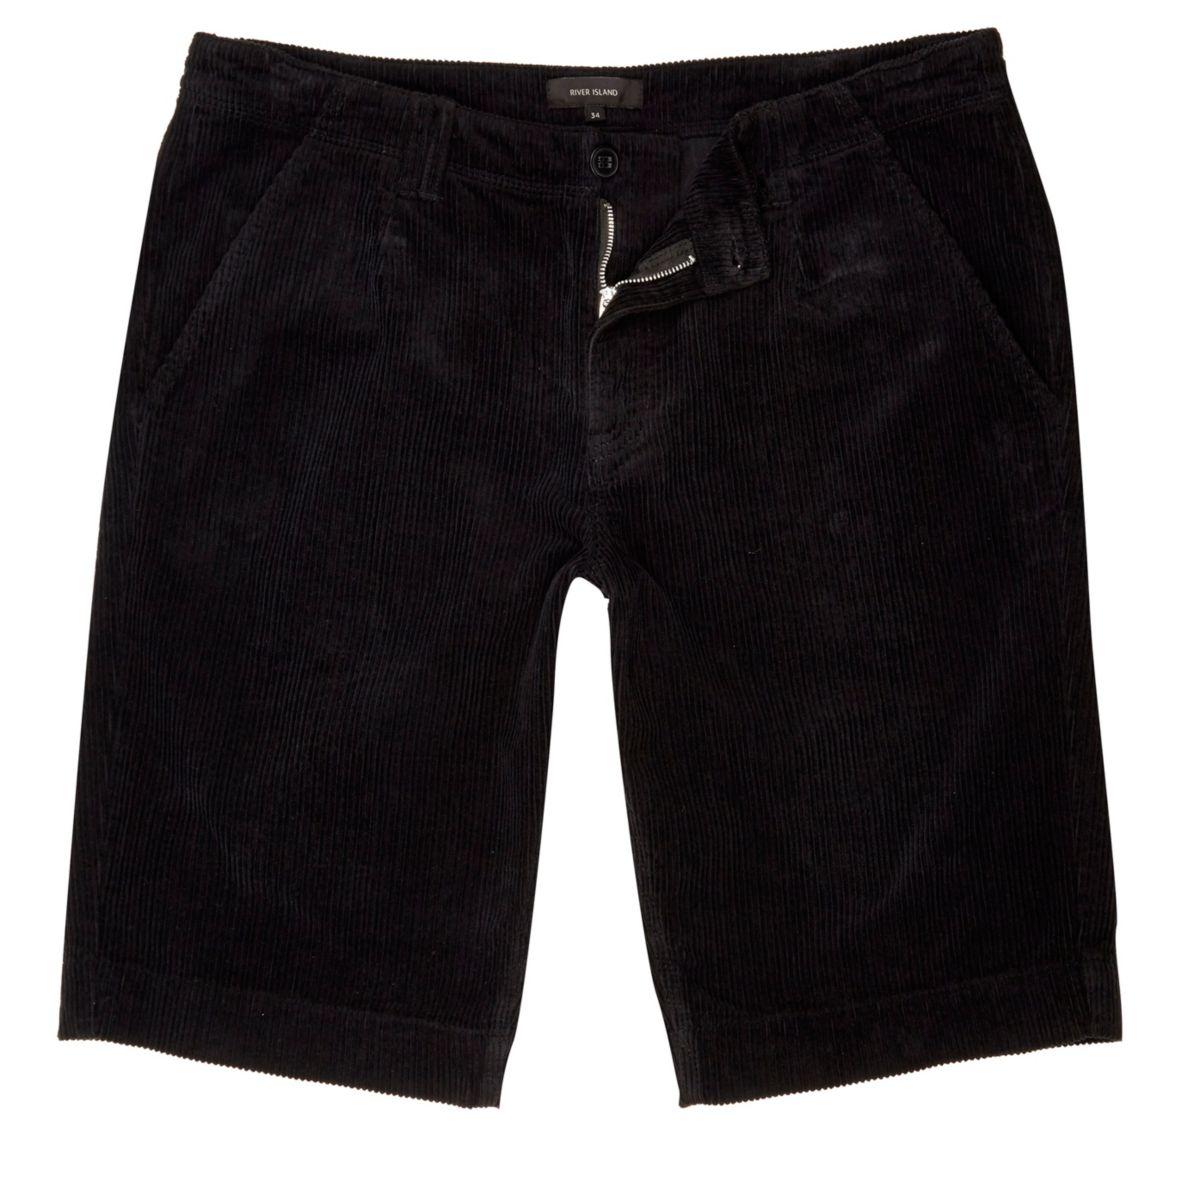 Black cord slim fit shorts